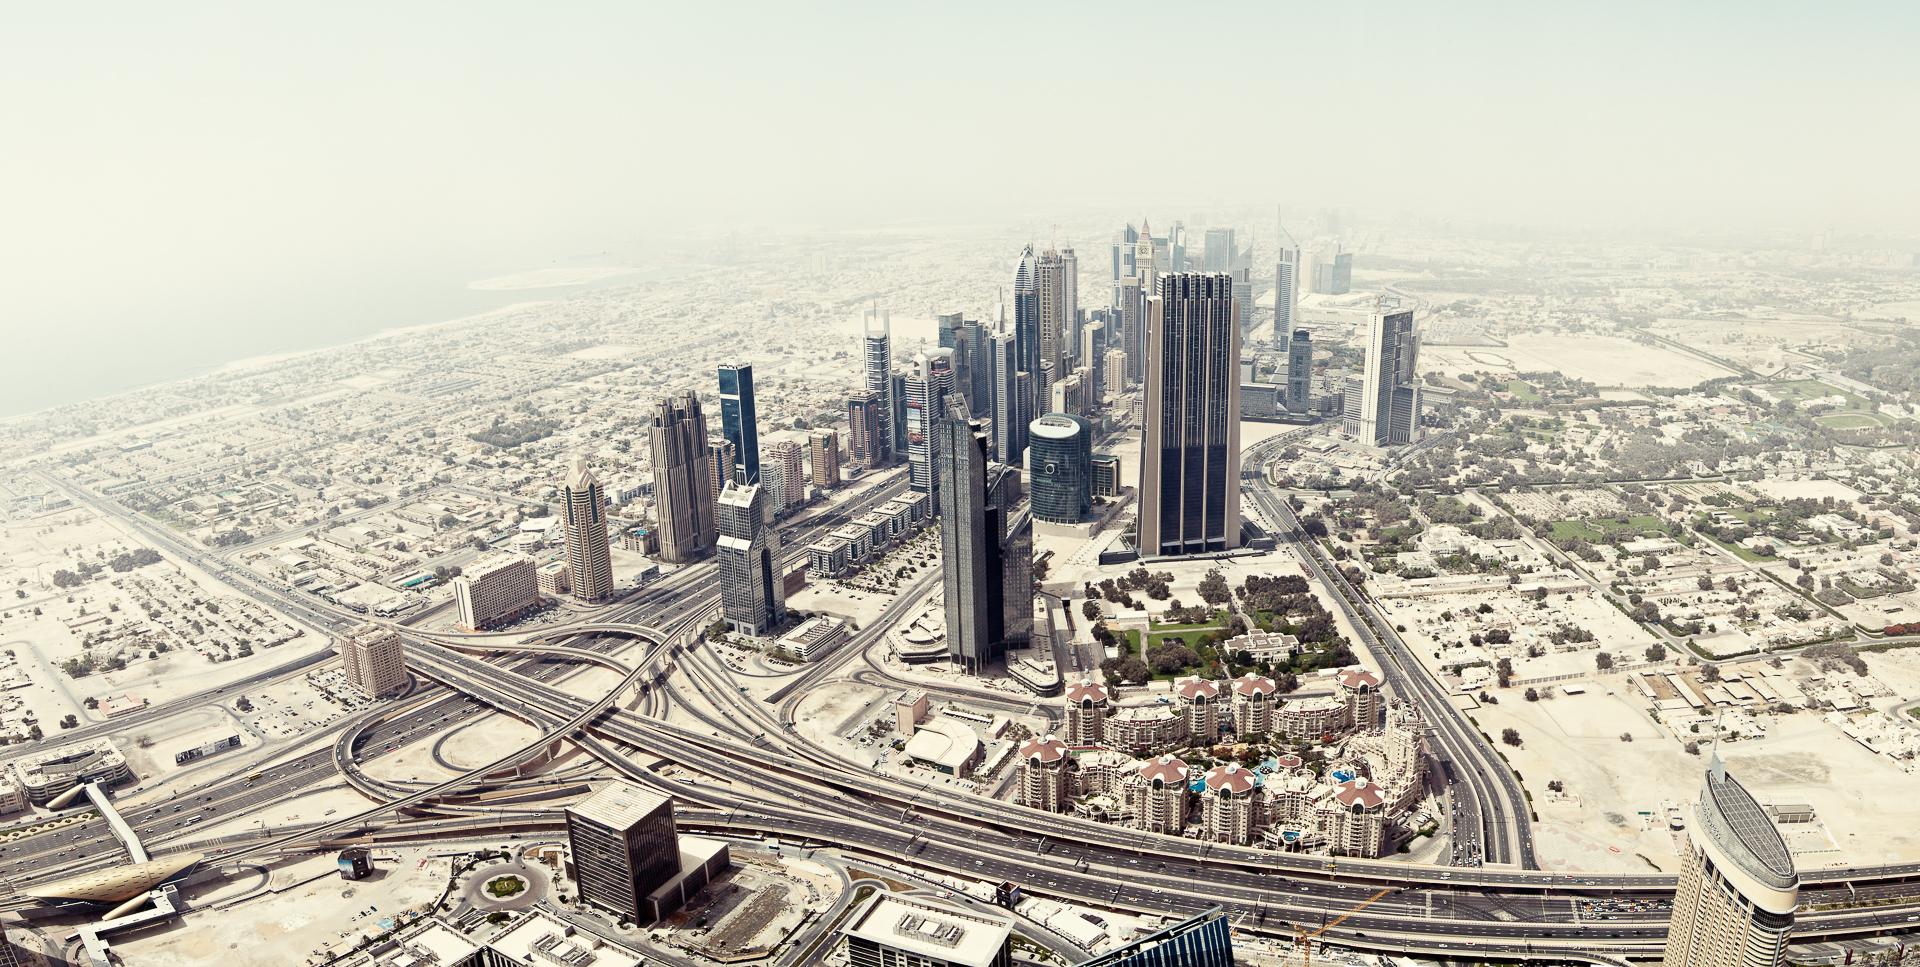 Gökhan_Orhan_Portfolio_Landscape_Dubai-1